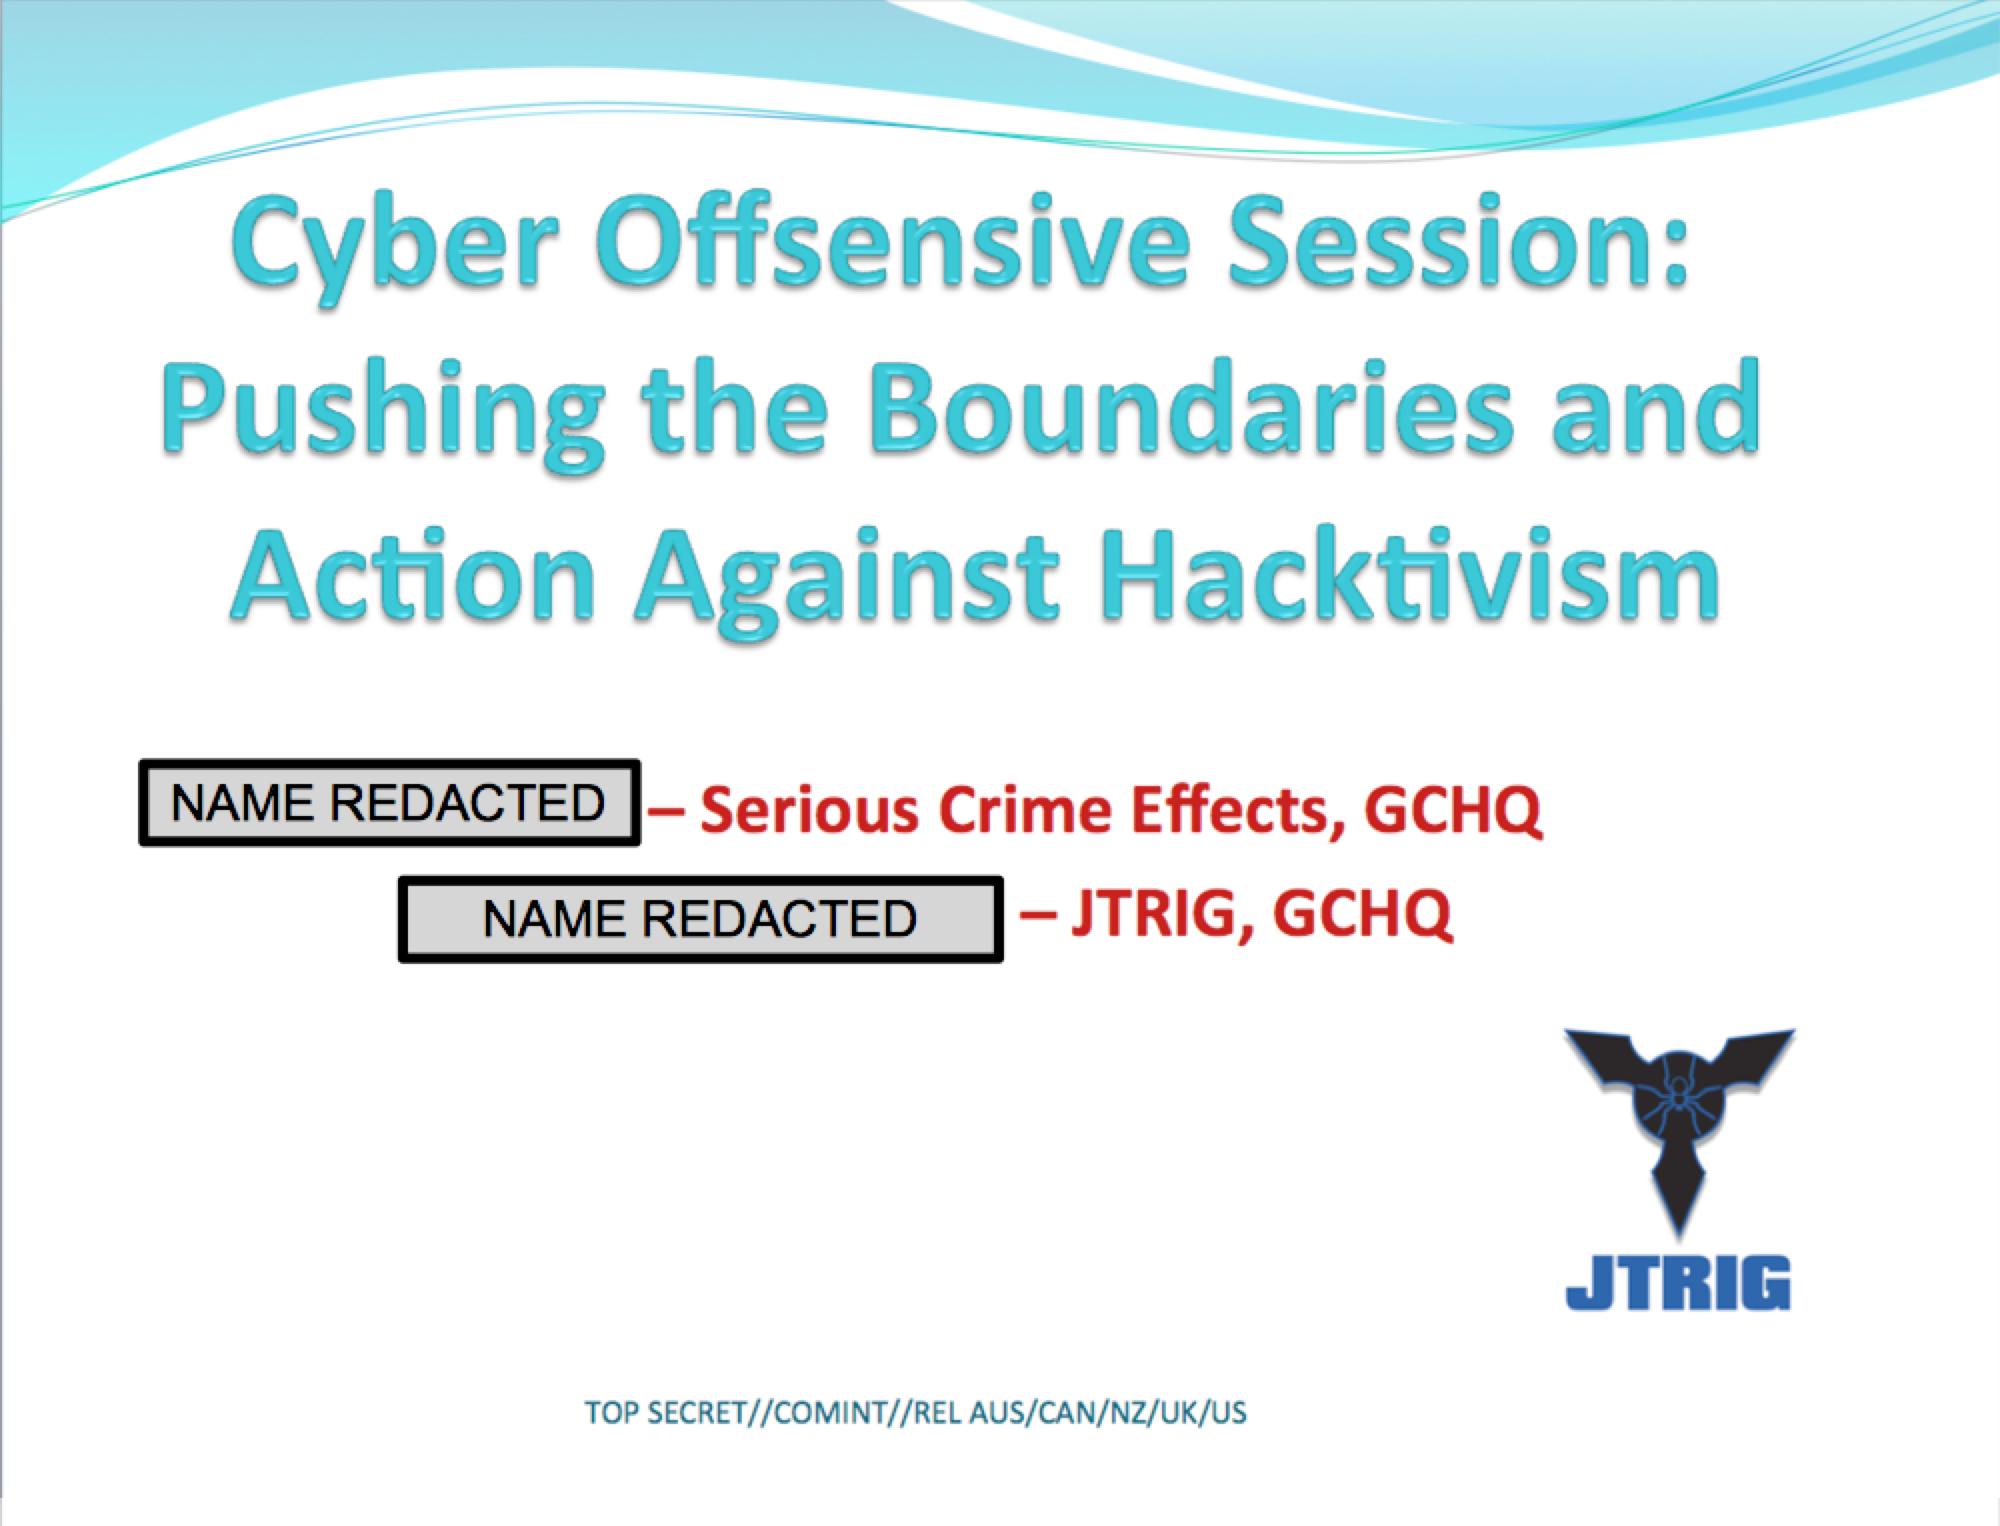 Pushing the Boundaries Against Hactivism